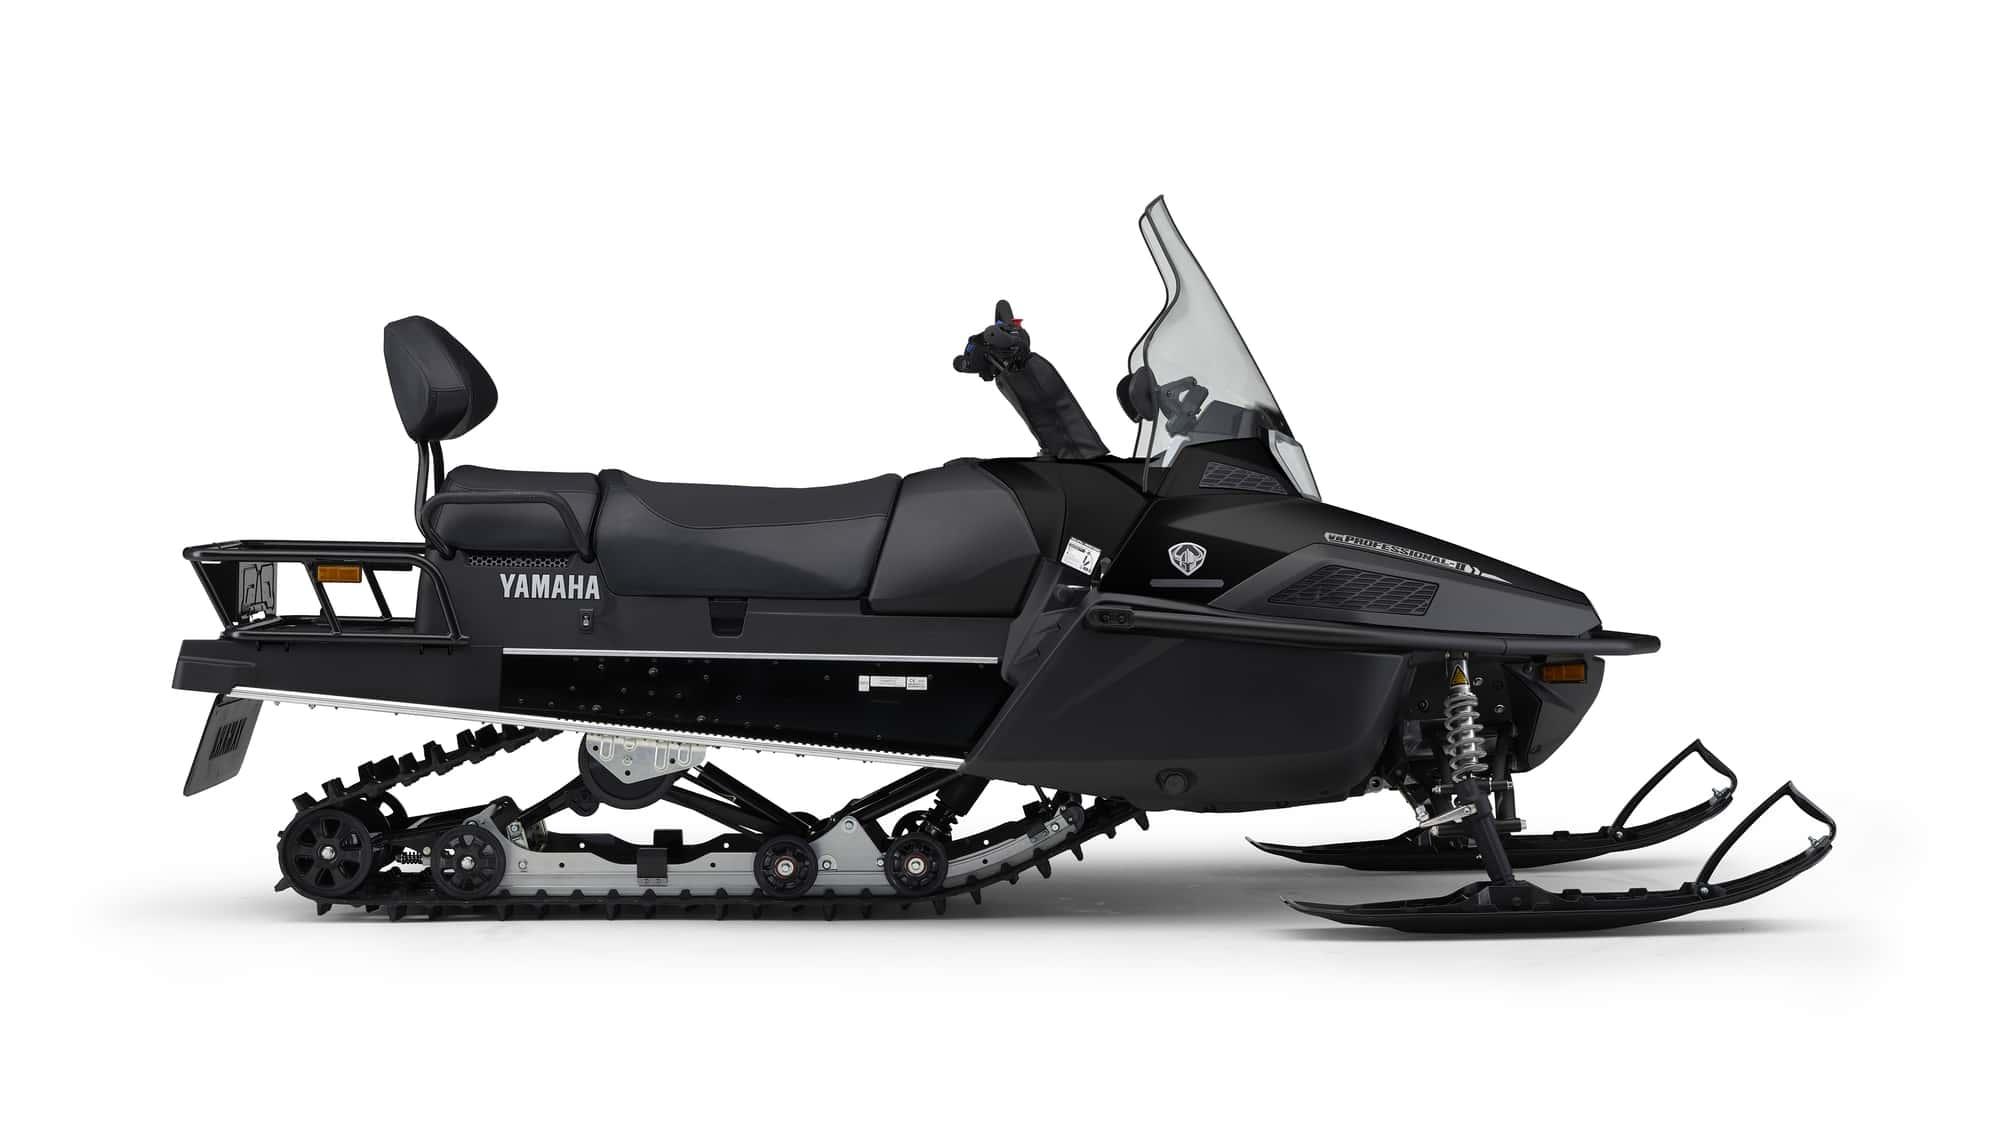 Взгляд профессионалов: снегоход Yamaha Viking – описание и сравнение модели